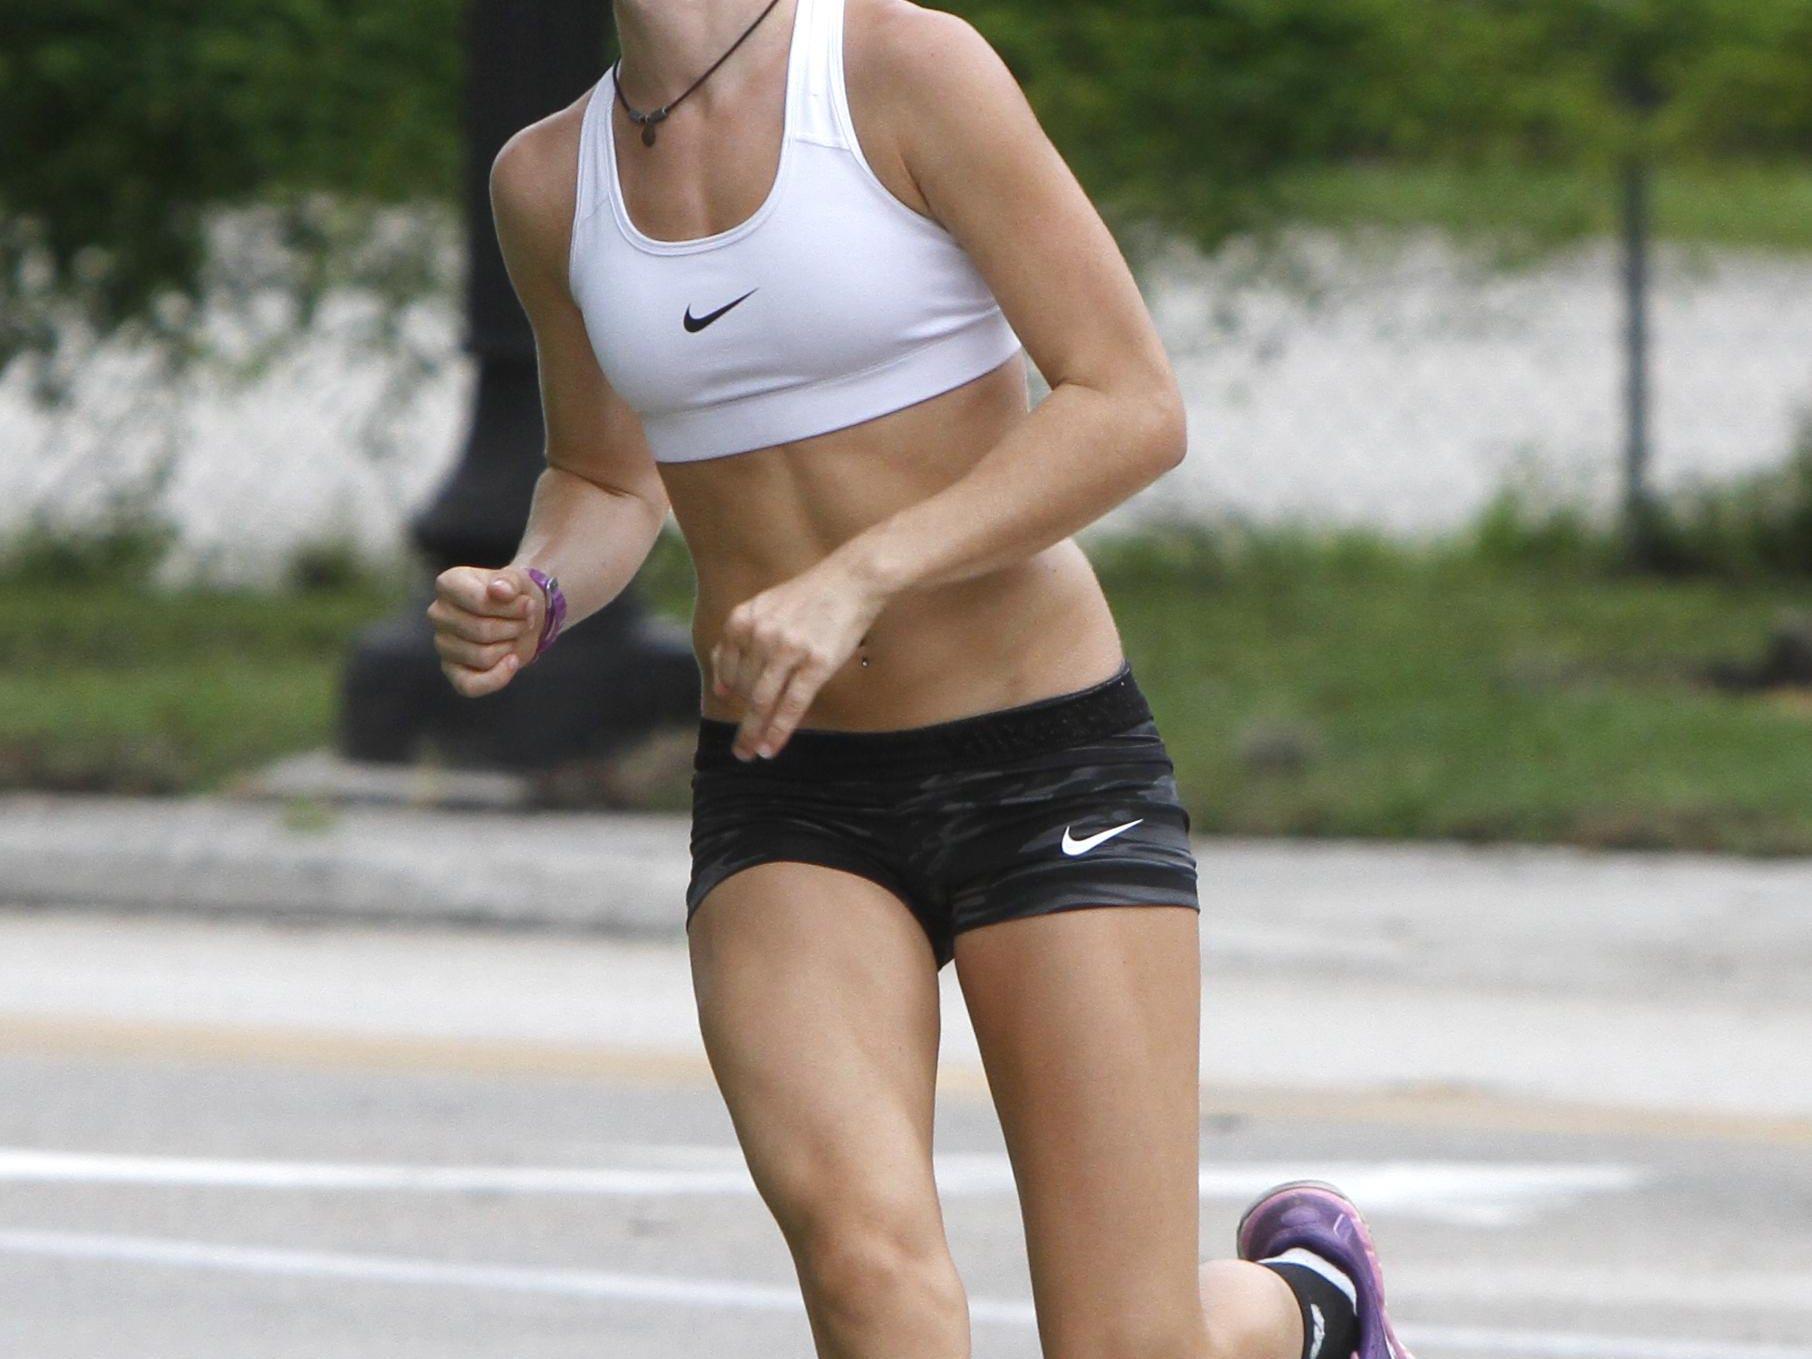 Fort Myers High School cross country runner Kristlin Gear runs near McGregor Avenue in Fort Myers Friday, August 28.